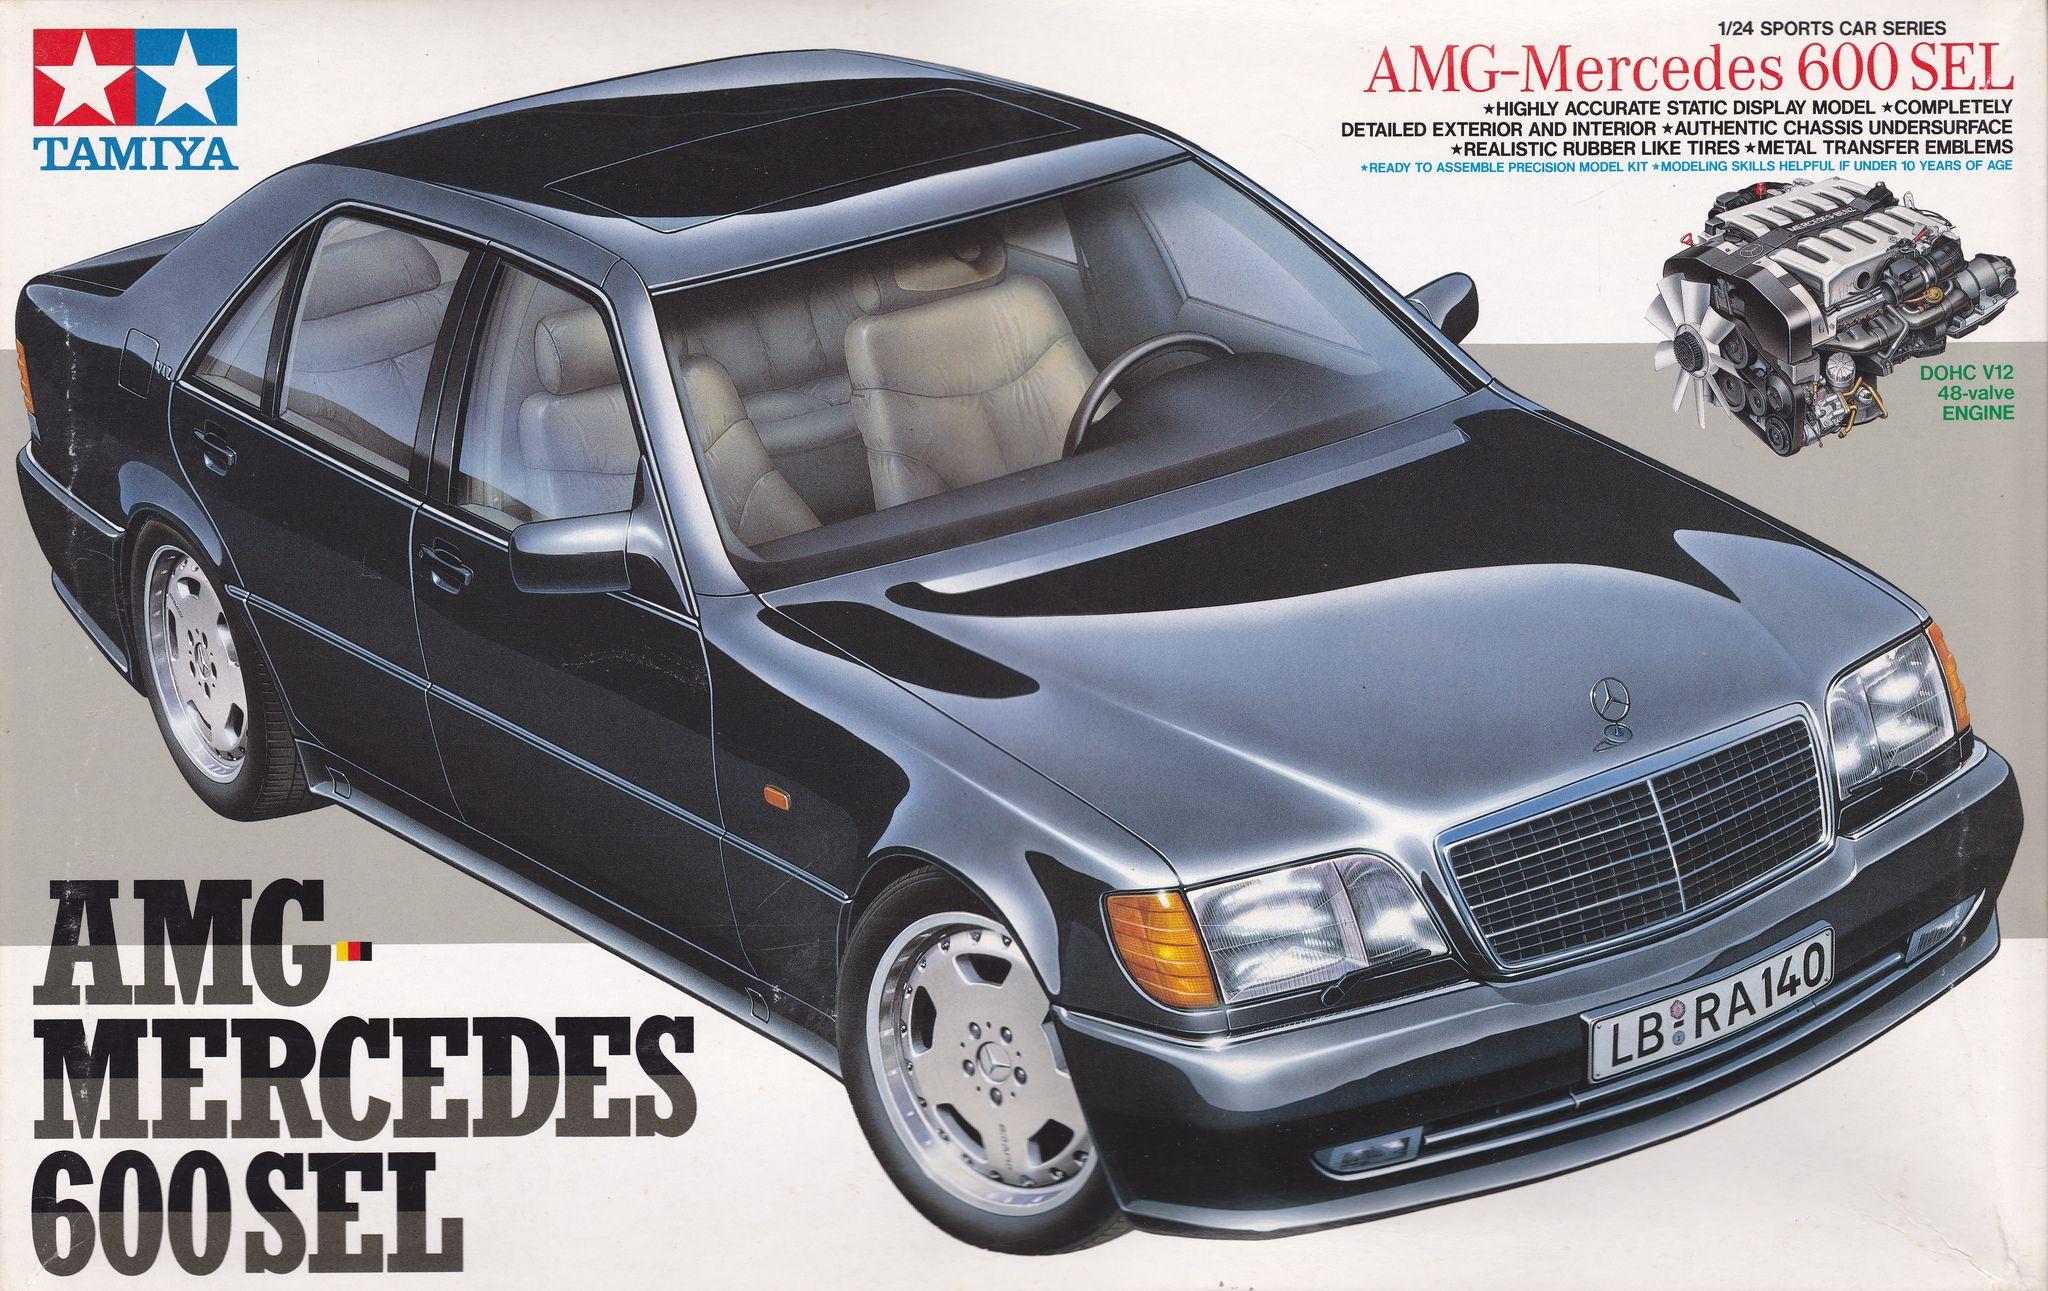 W140 Mercedes Benz 600 Sel S Class Amg